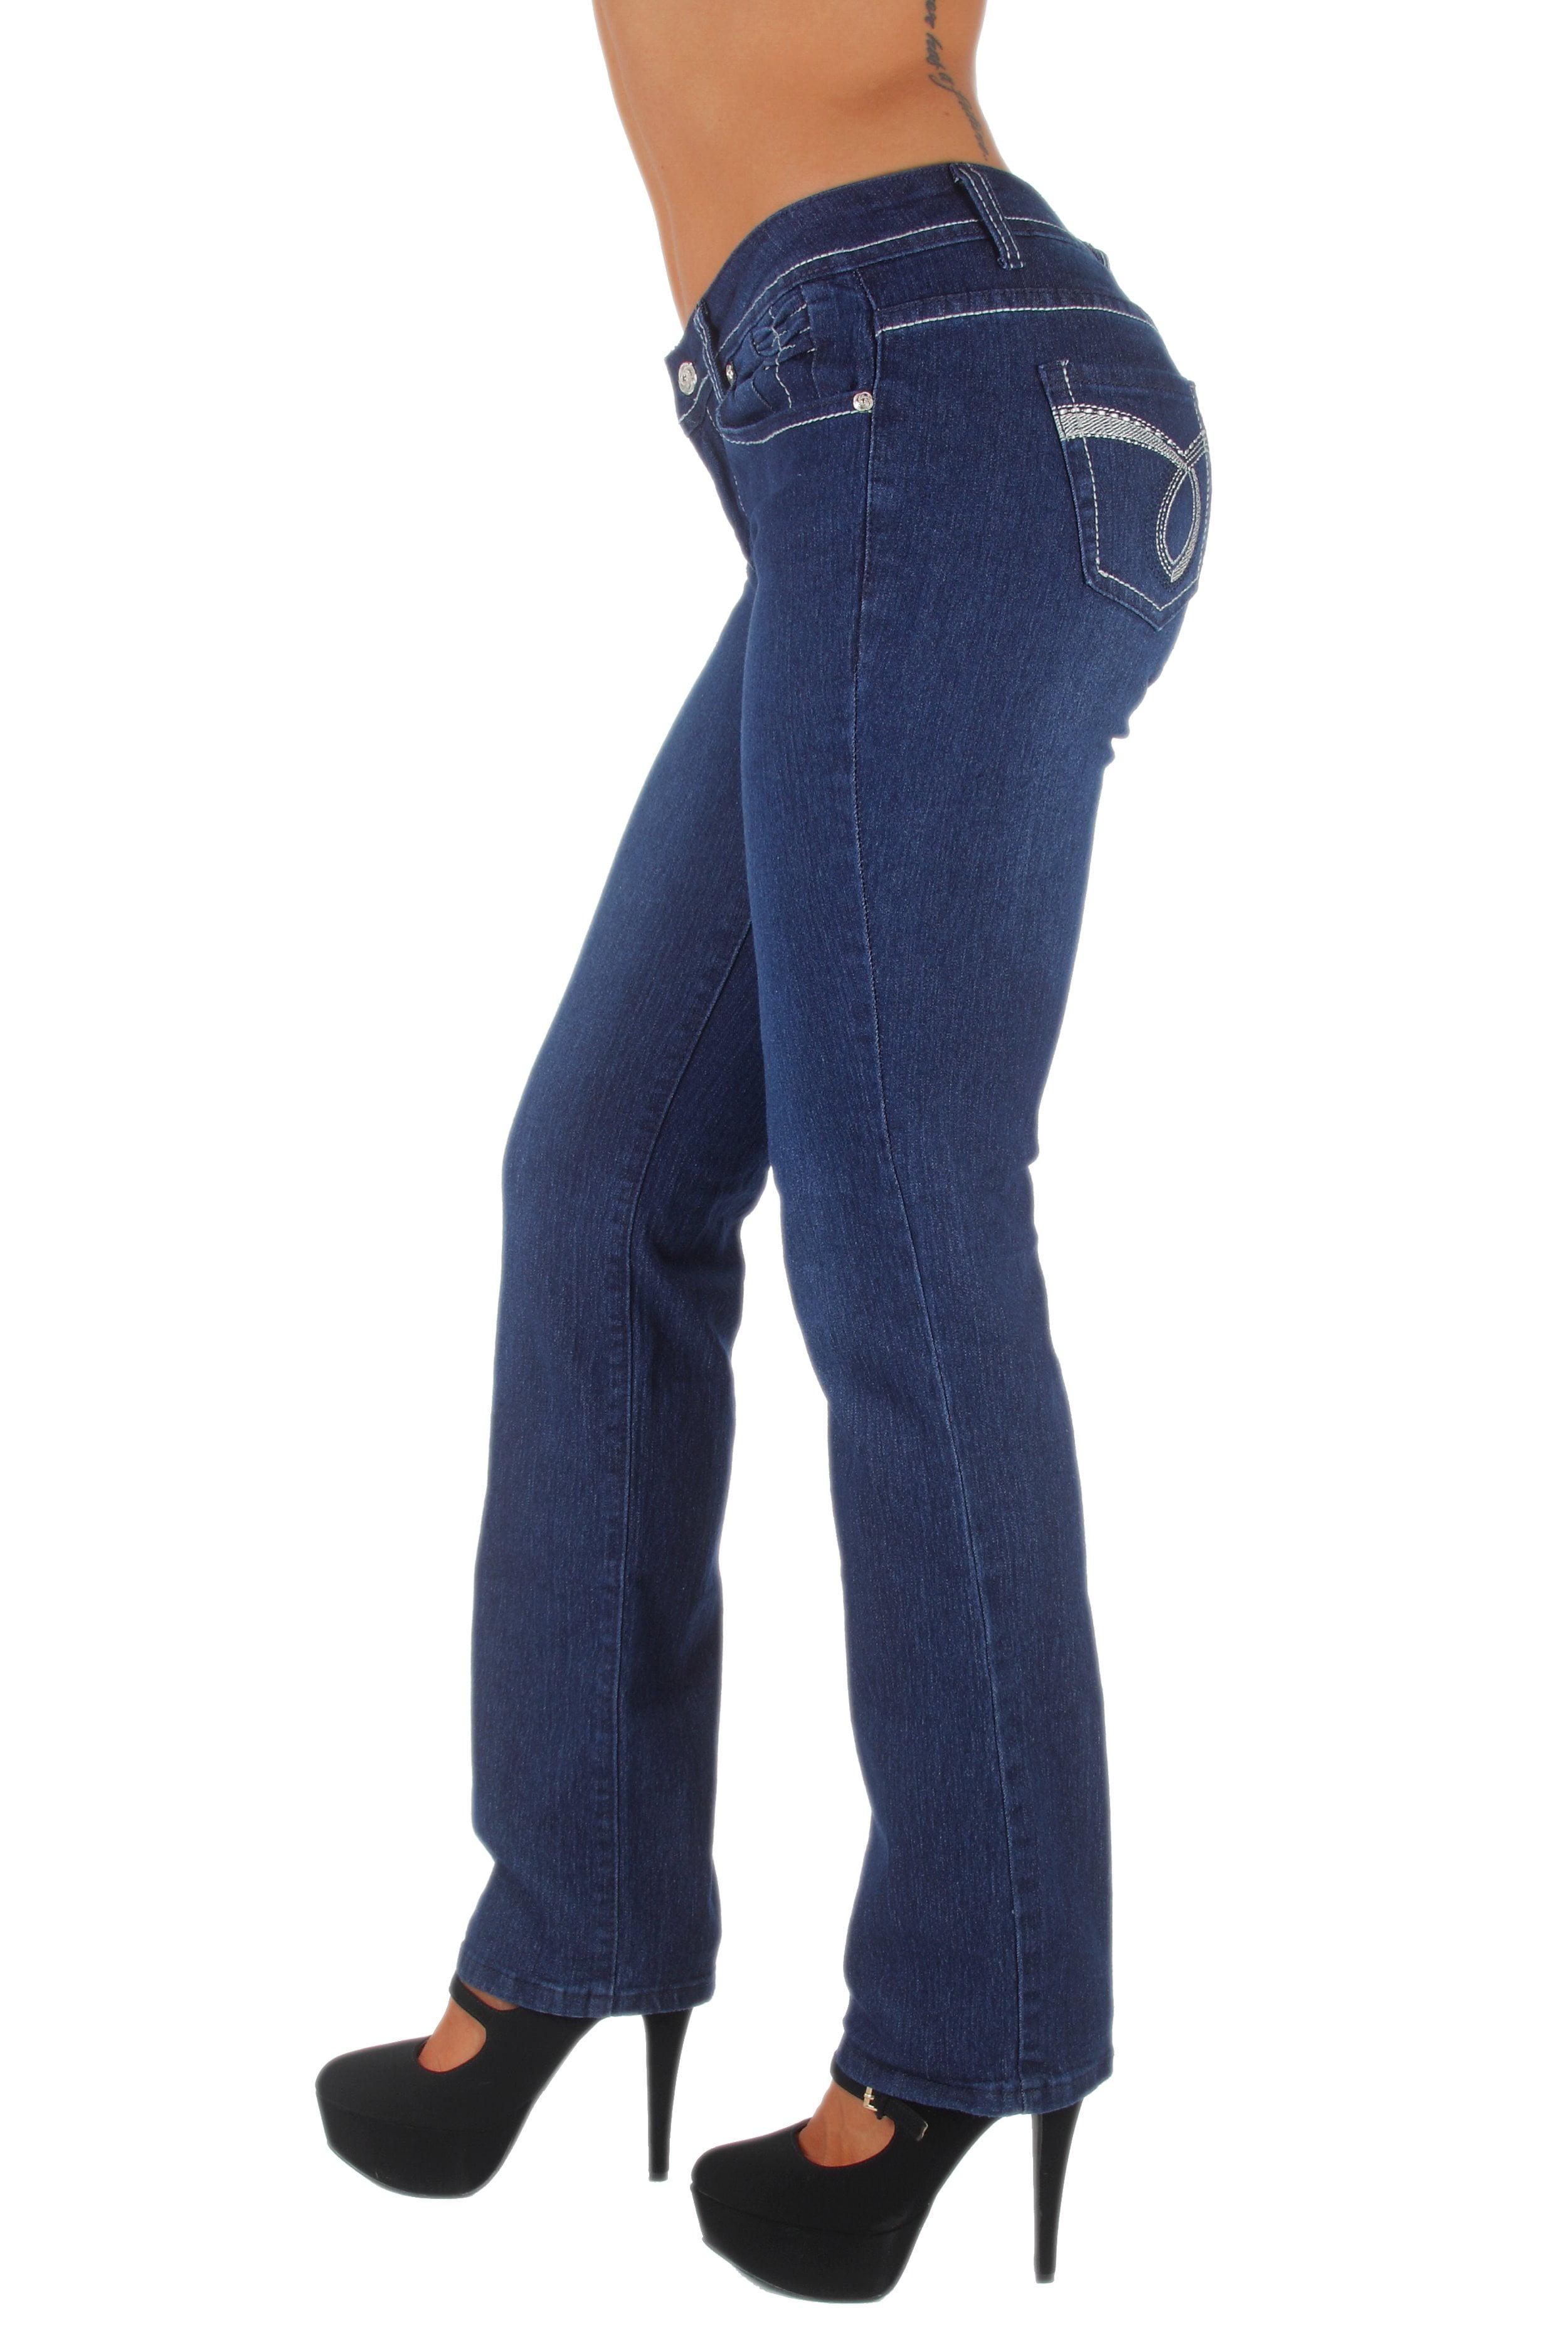 Style WG0010BTP  Plus Size, Classic 5 Pockets, Boot Leg Jeans